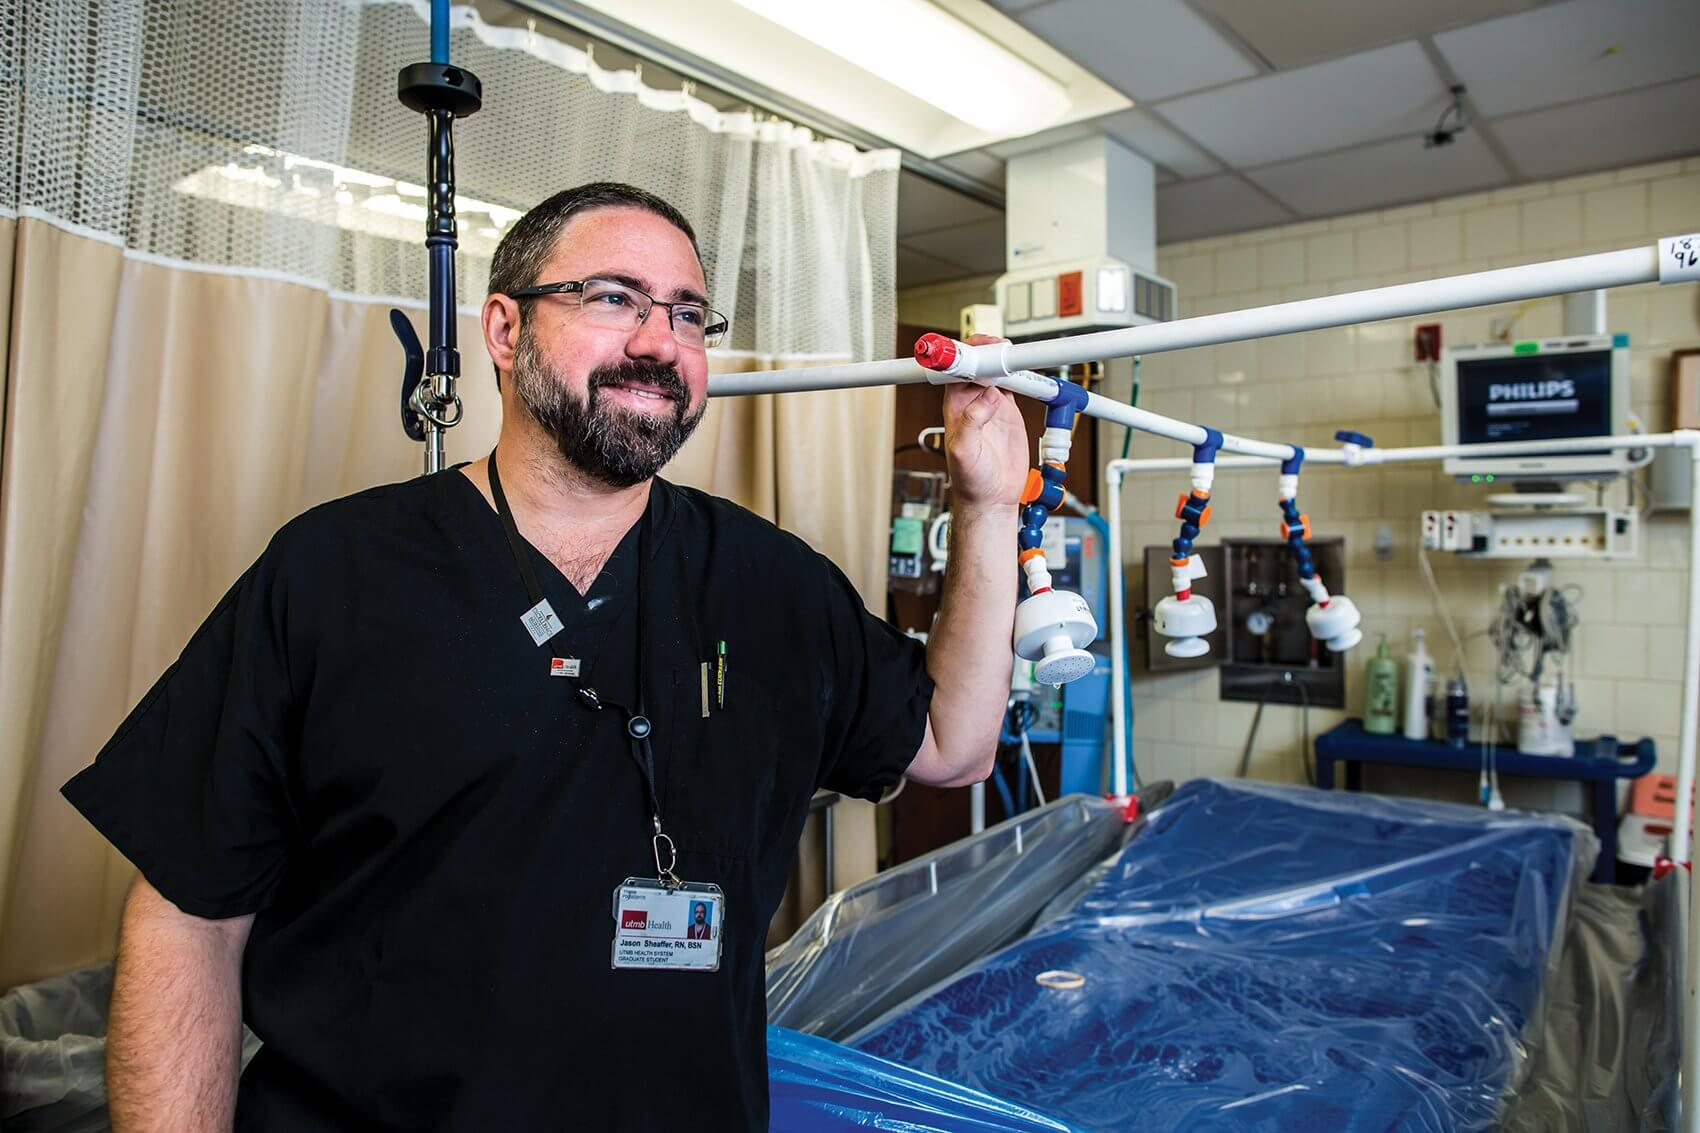 Jason Sheaffer, Blocker Burn Unit nurse at UTMB